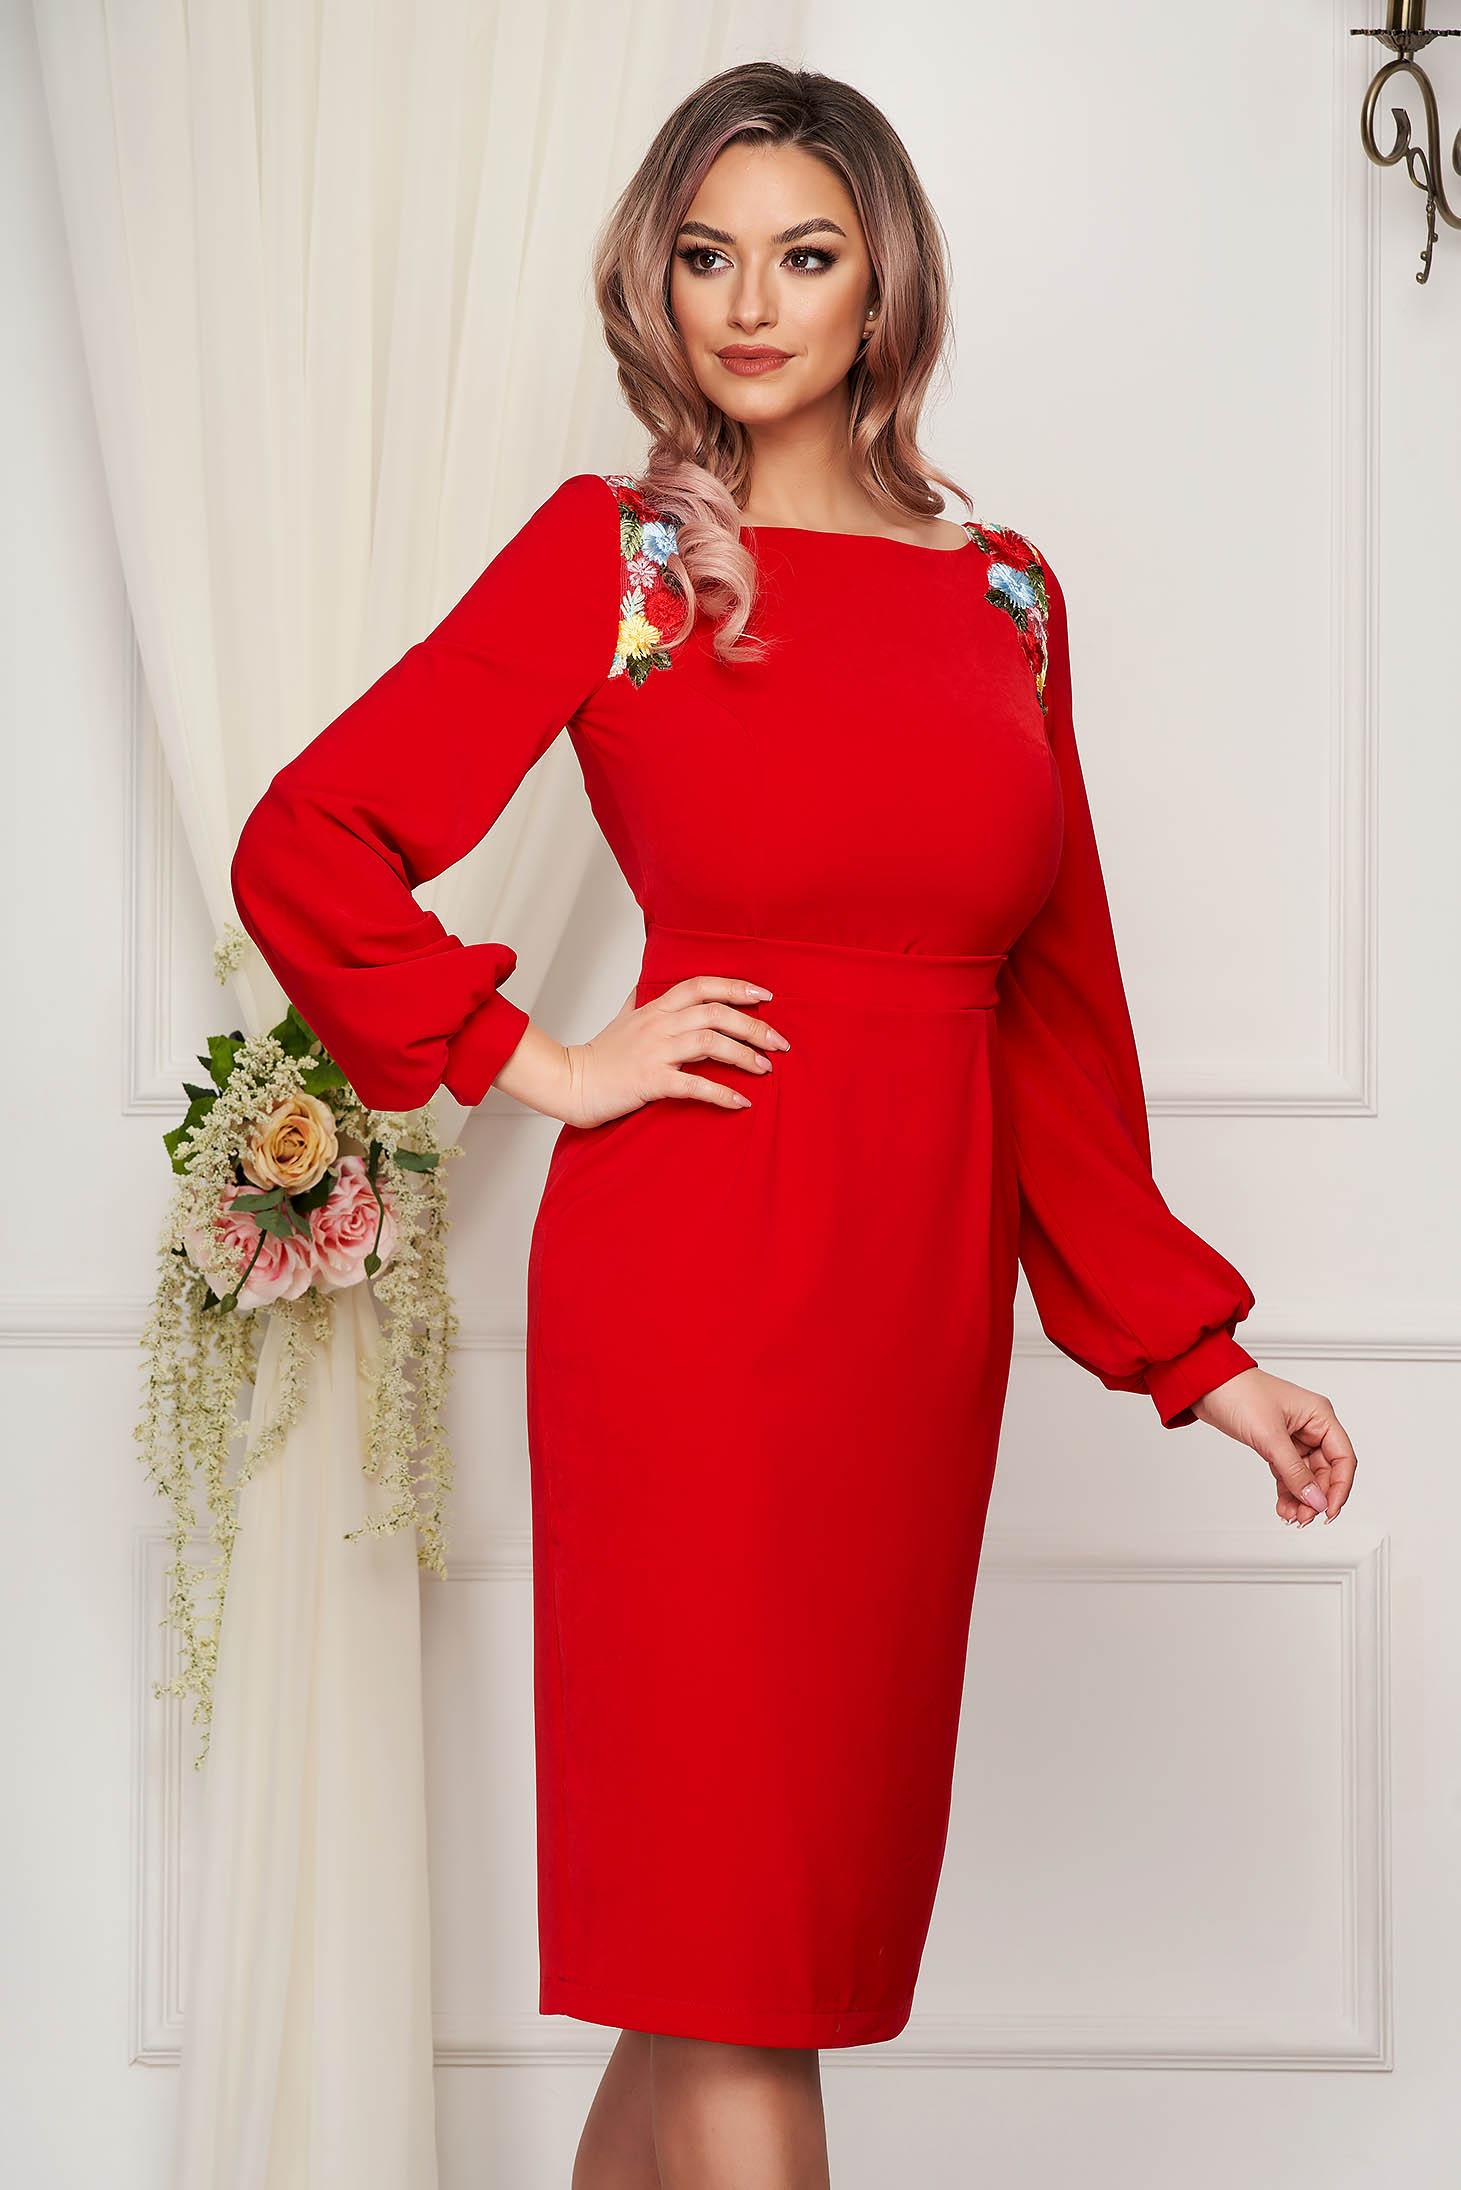 Occasional midi dress StarShinerS red pencil cloth thin fabric